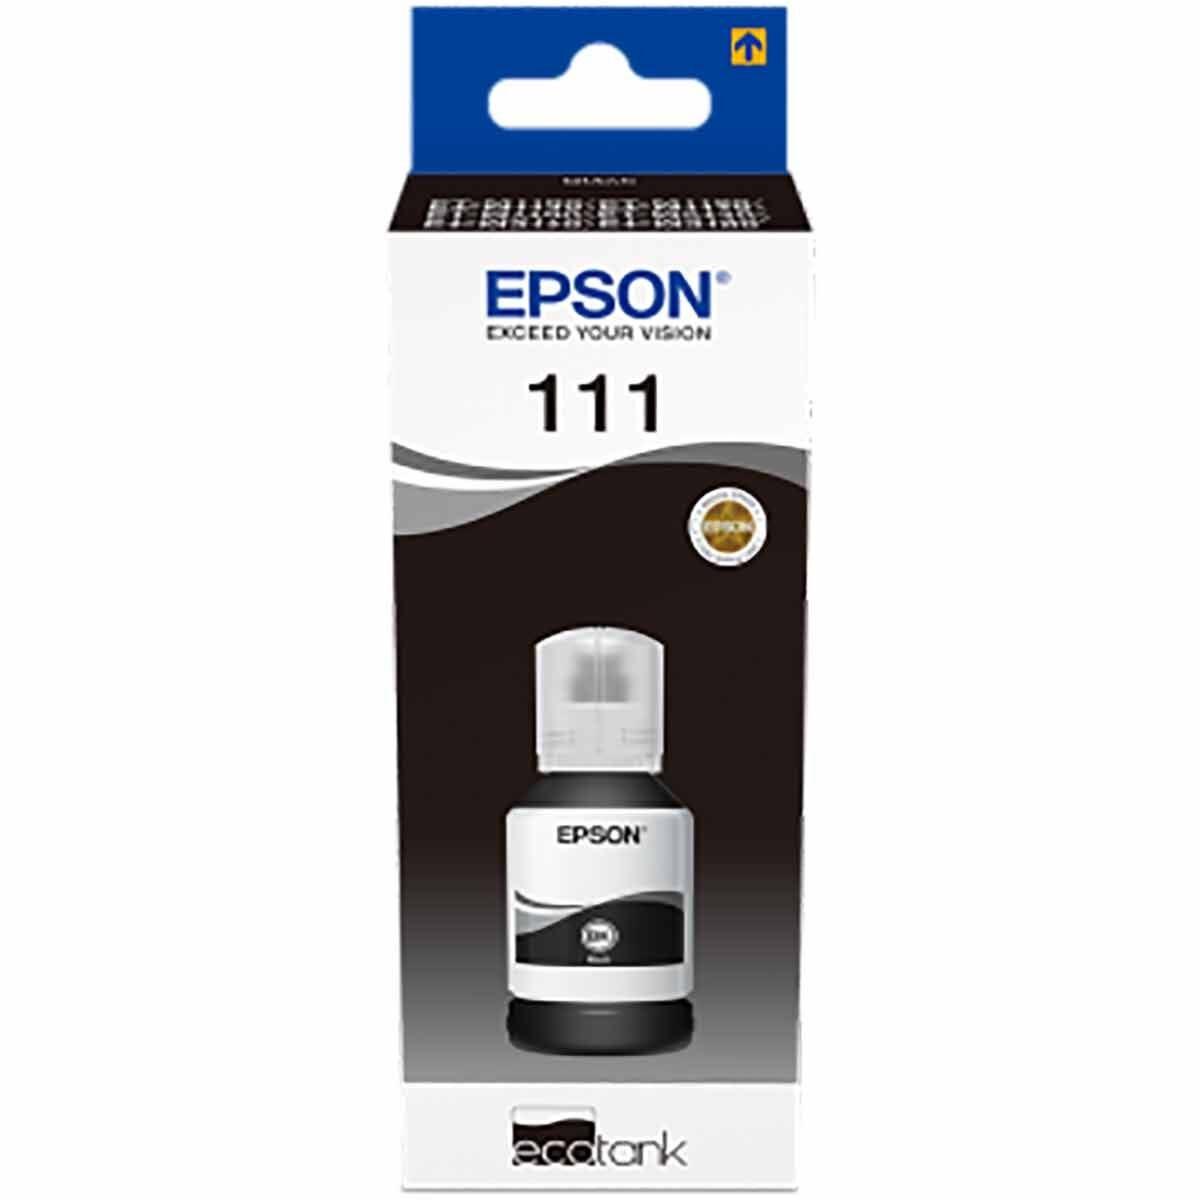 Epson EcoTank 111 Black Original Ink Bottle